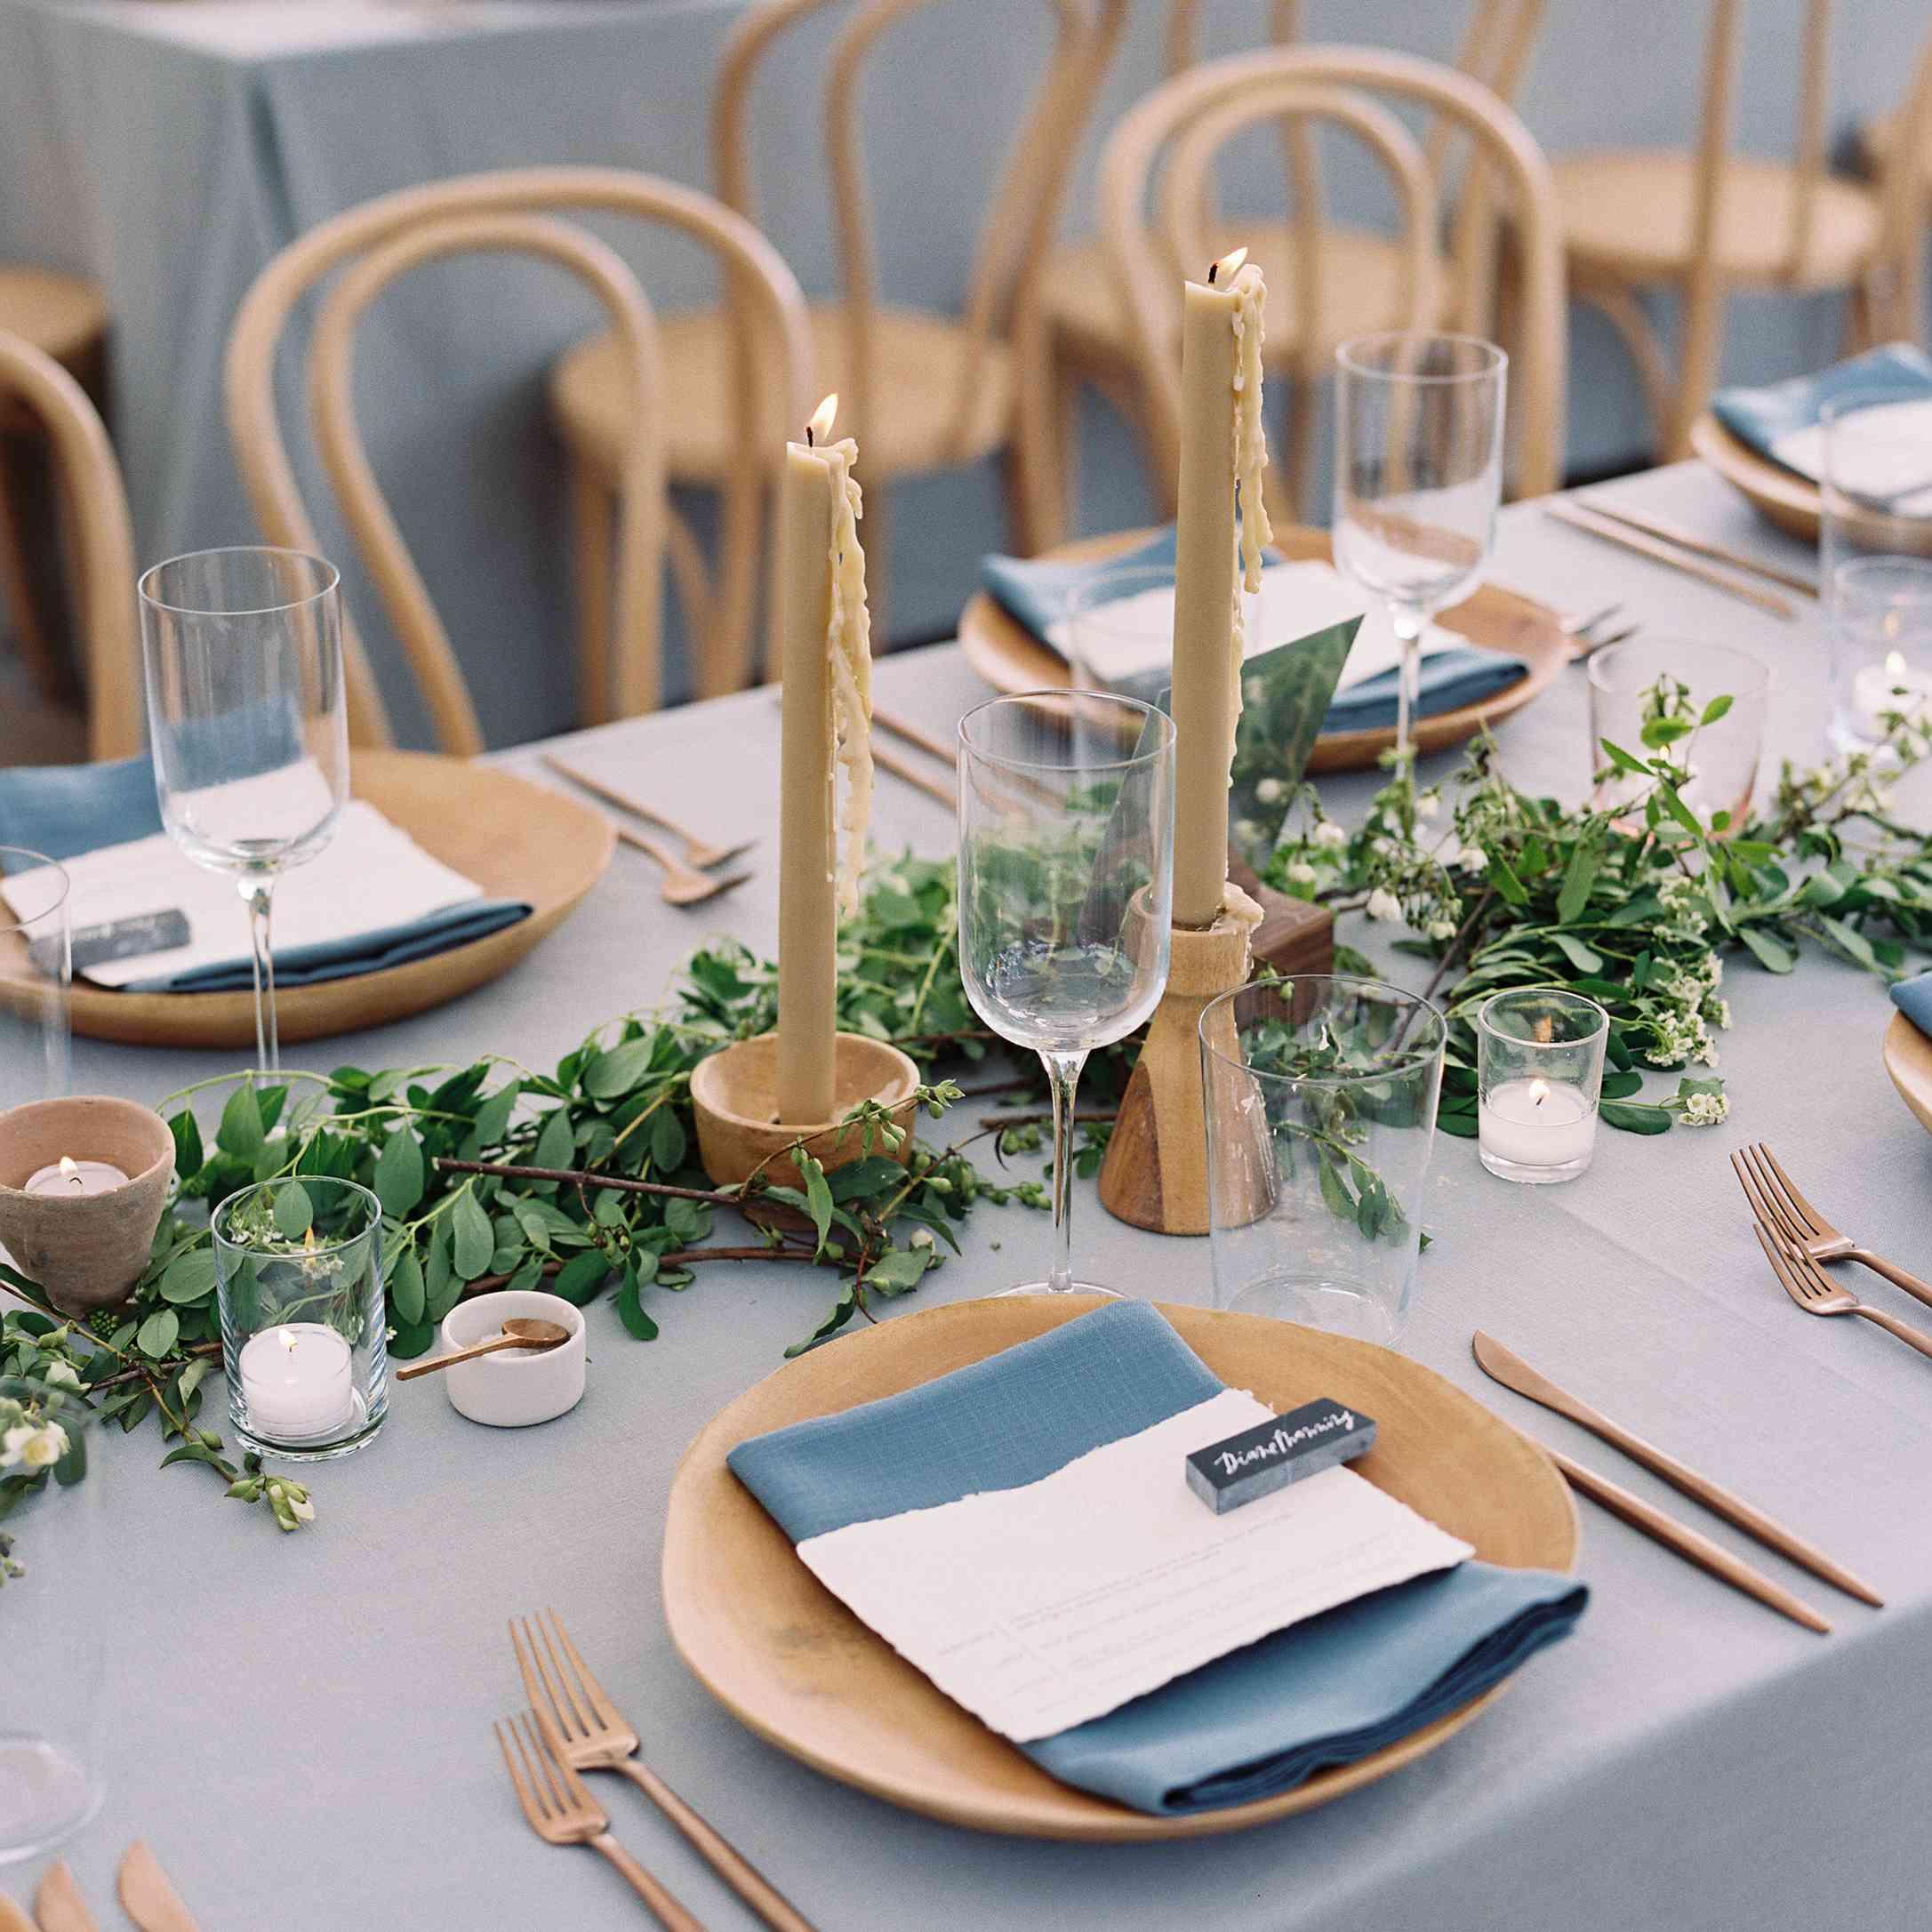 41 Rustic Wedding Centerpieces to Inspire Your Design